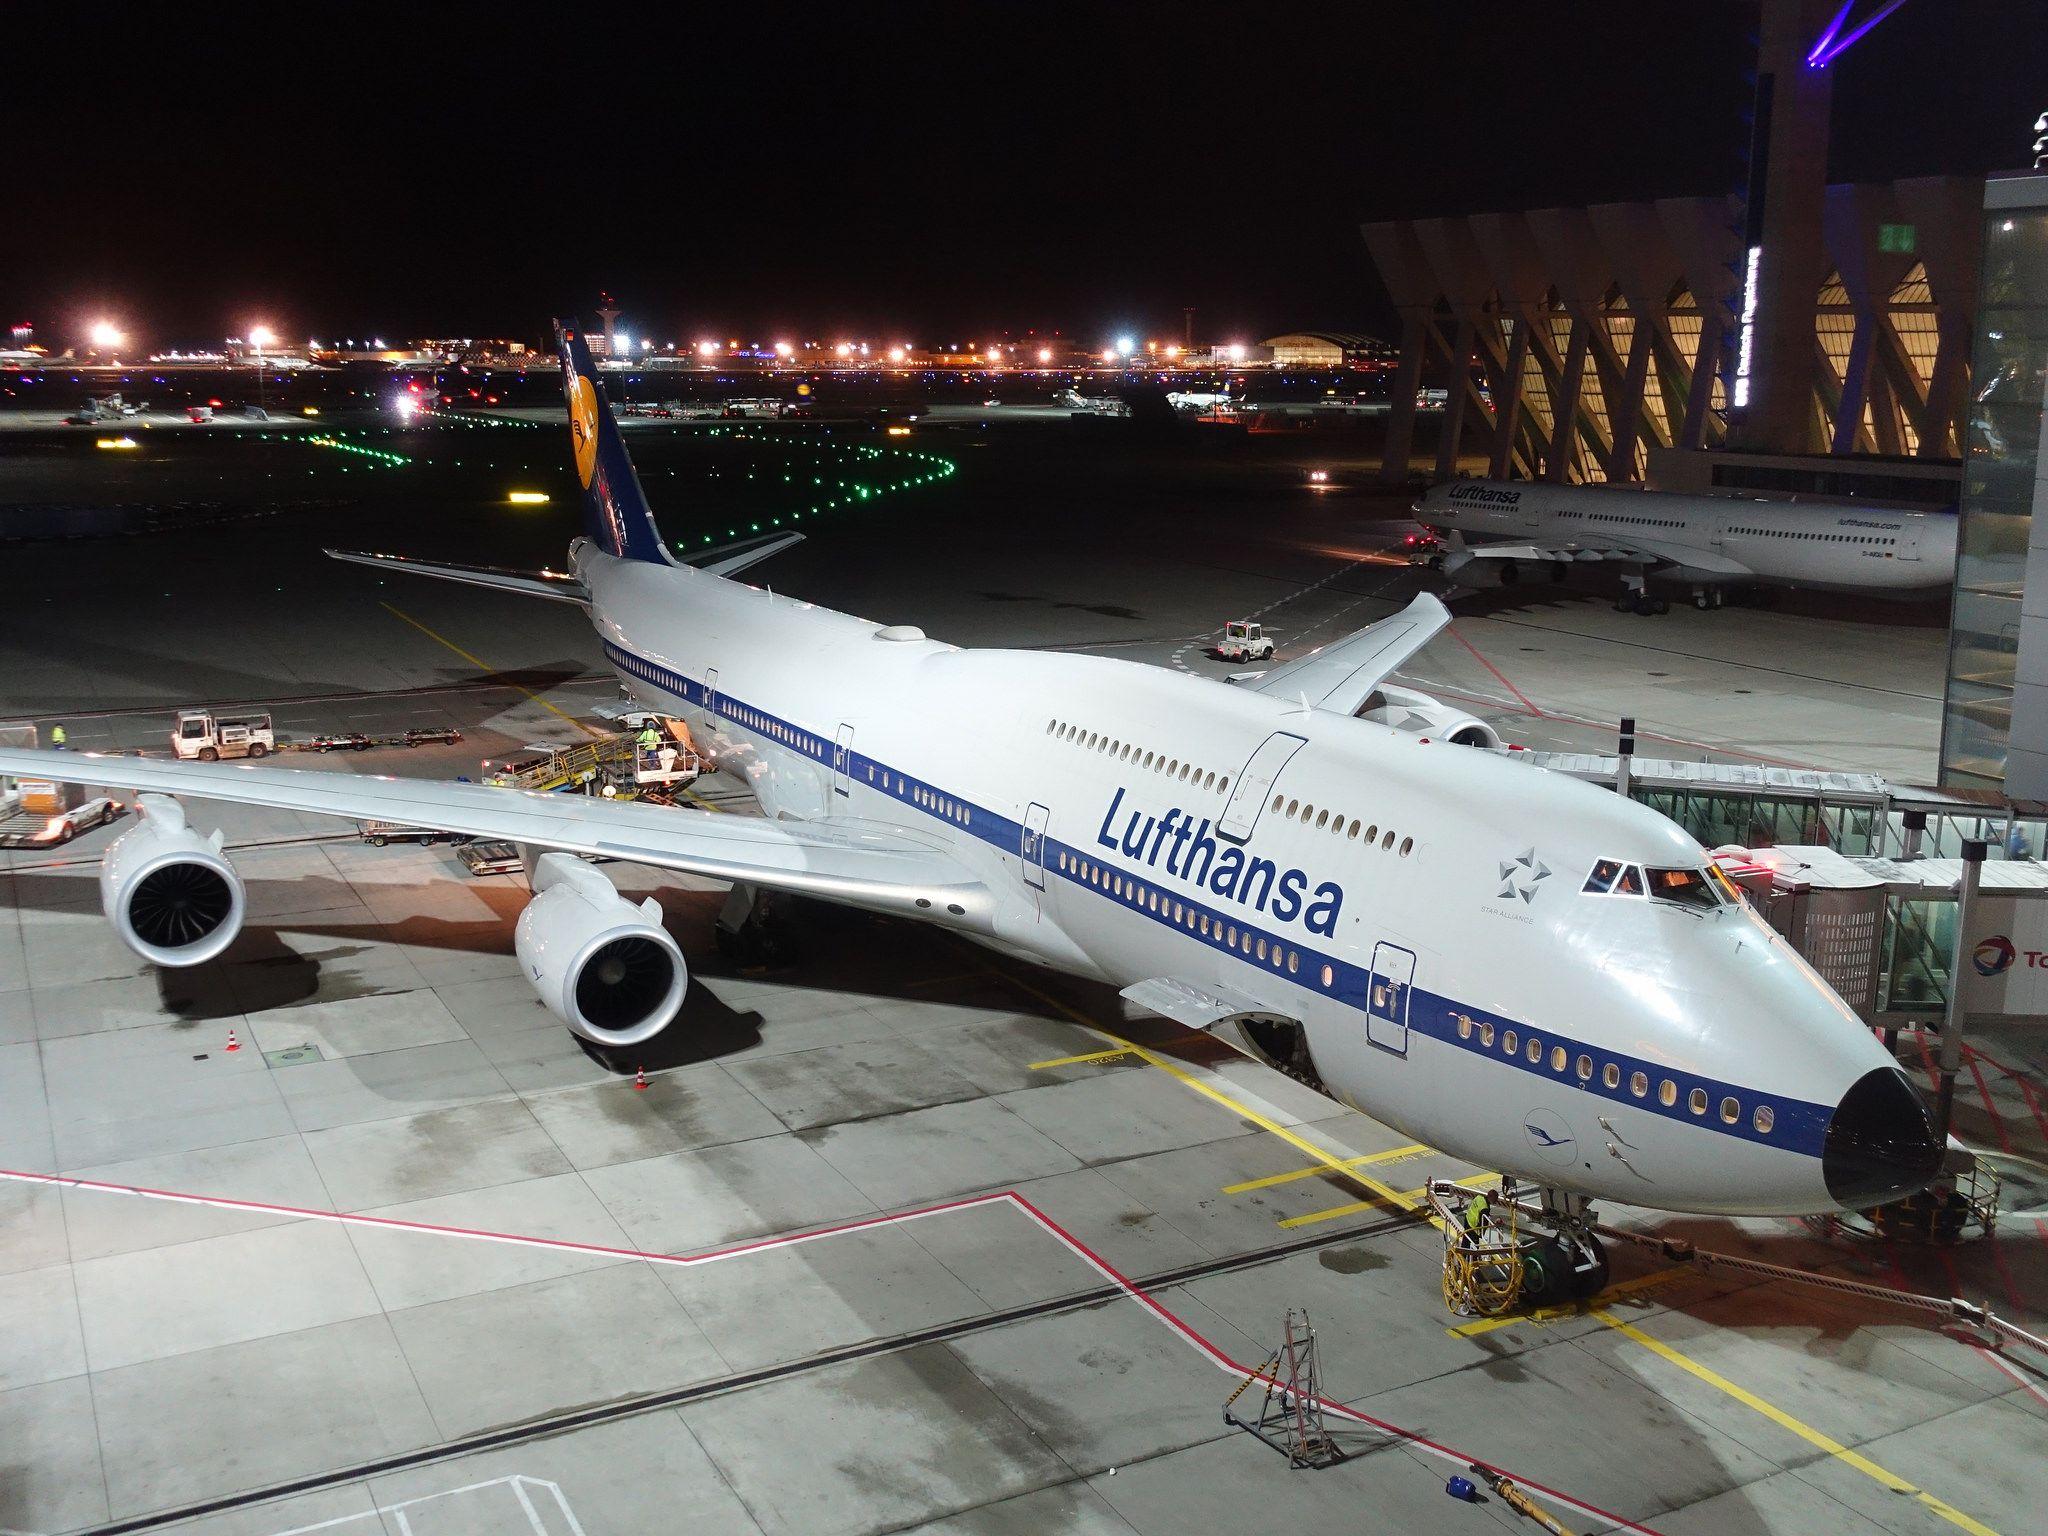 201710466 Frankfurt Main Airport With Lh Airplane Frankfurt Airplane Boeing